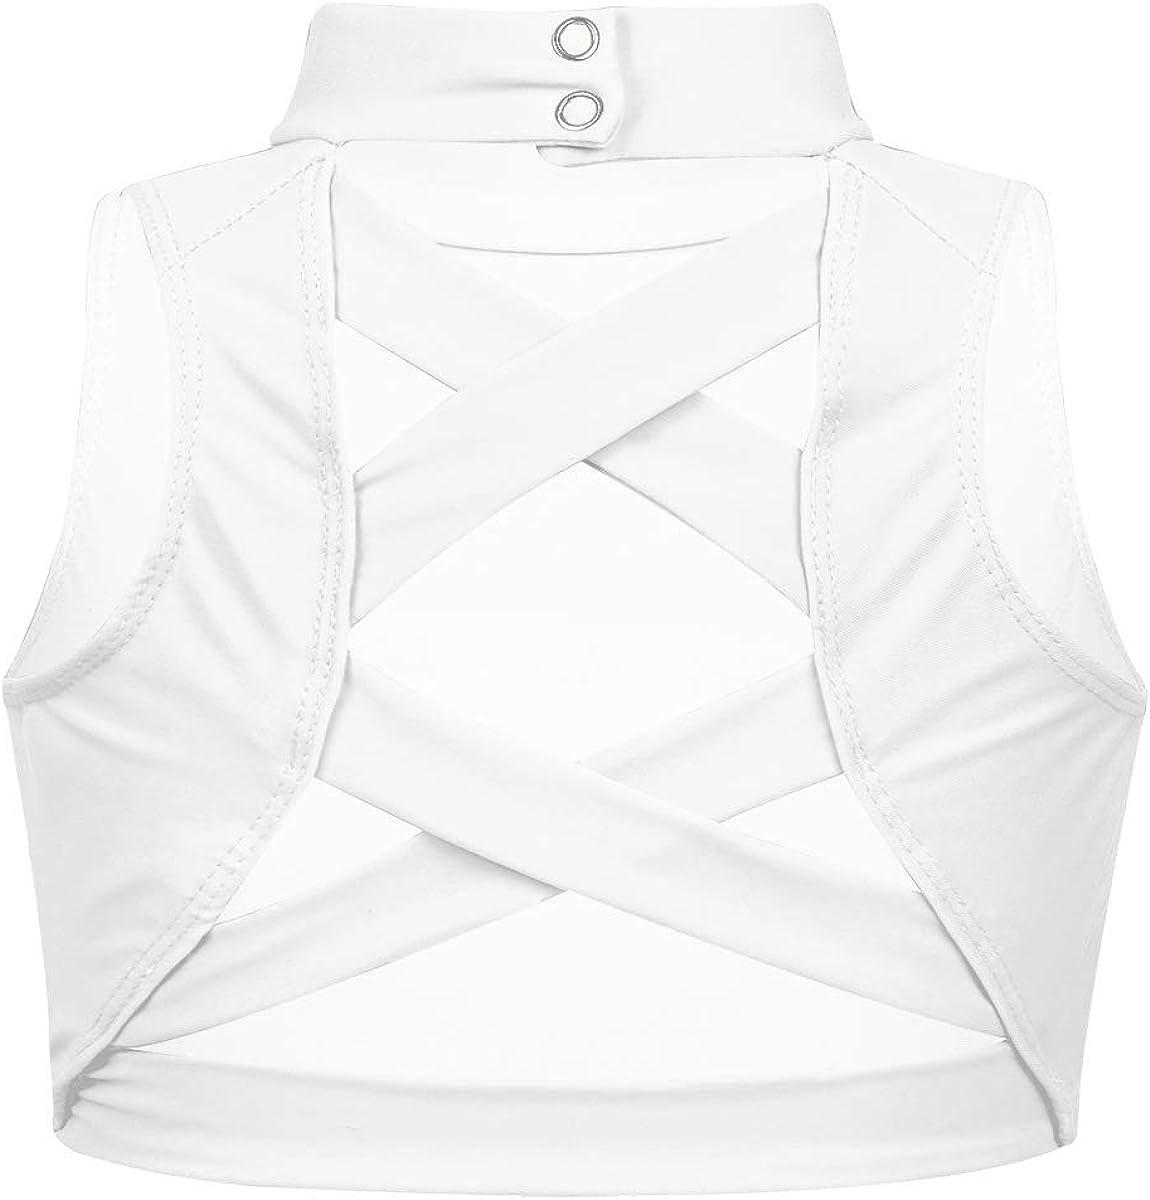 VernLan Sleeveless Mock Neck Crop Top for Teens Girls Athletic Sports Bra Ballet Dance Top Shirt Gymnastics Activewear Criss Cross Ivory 14